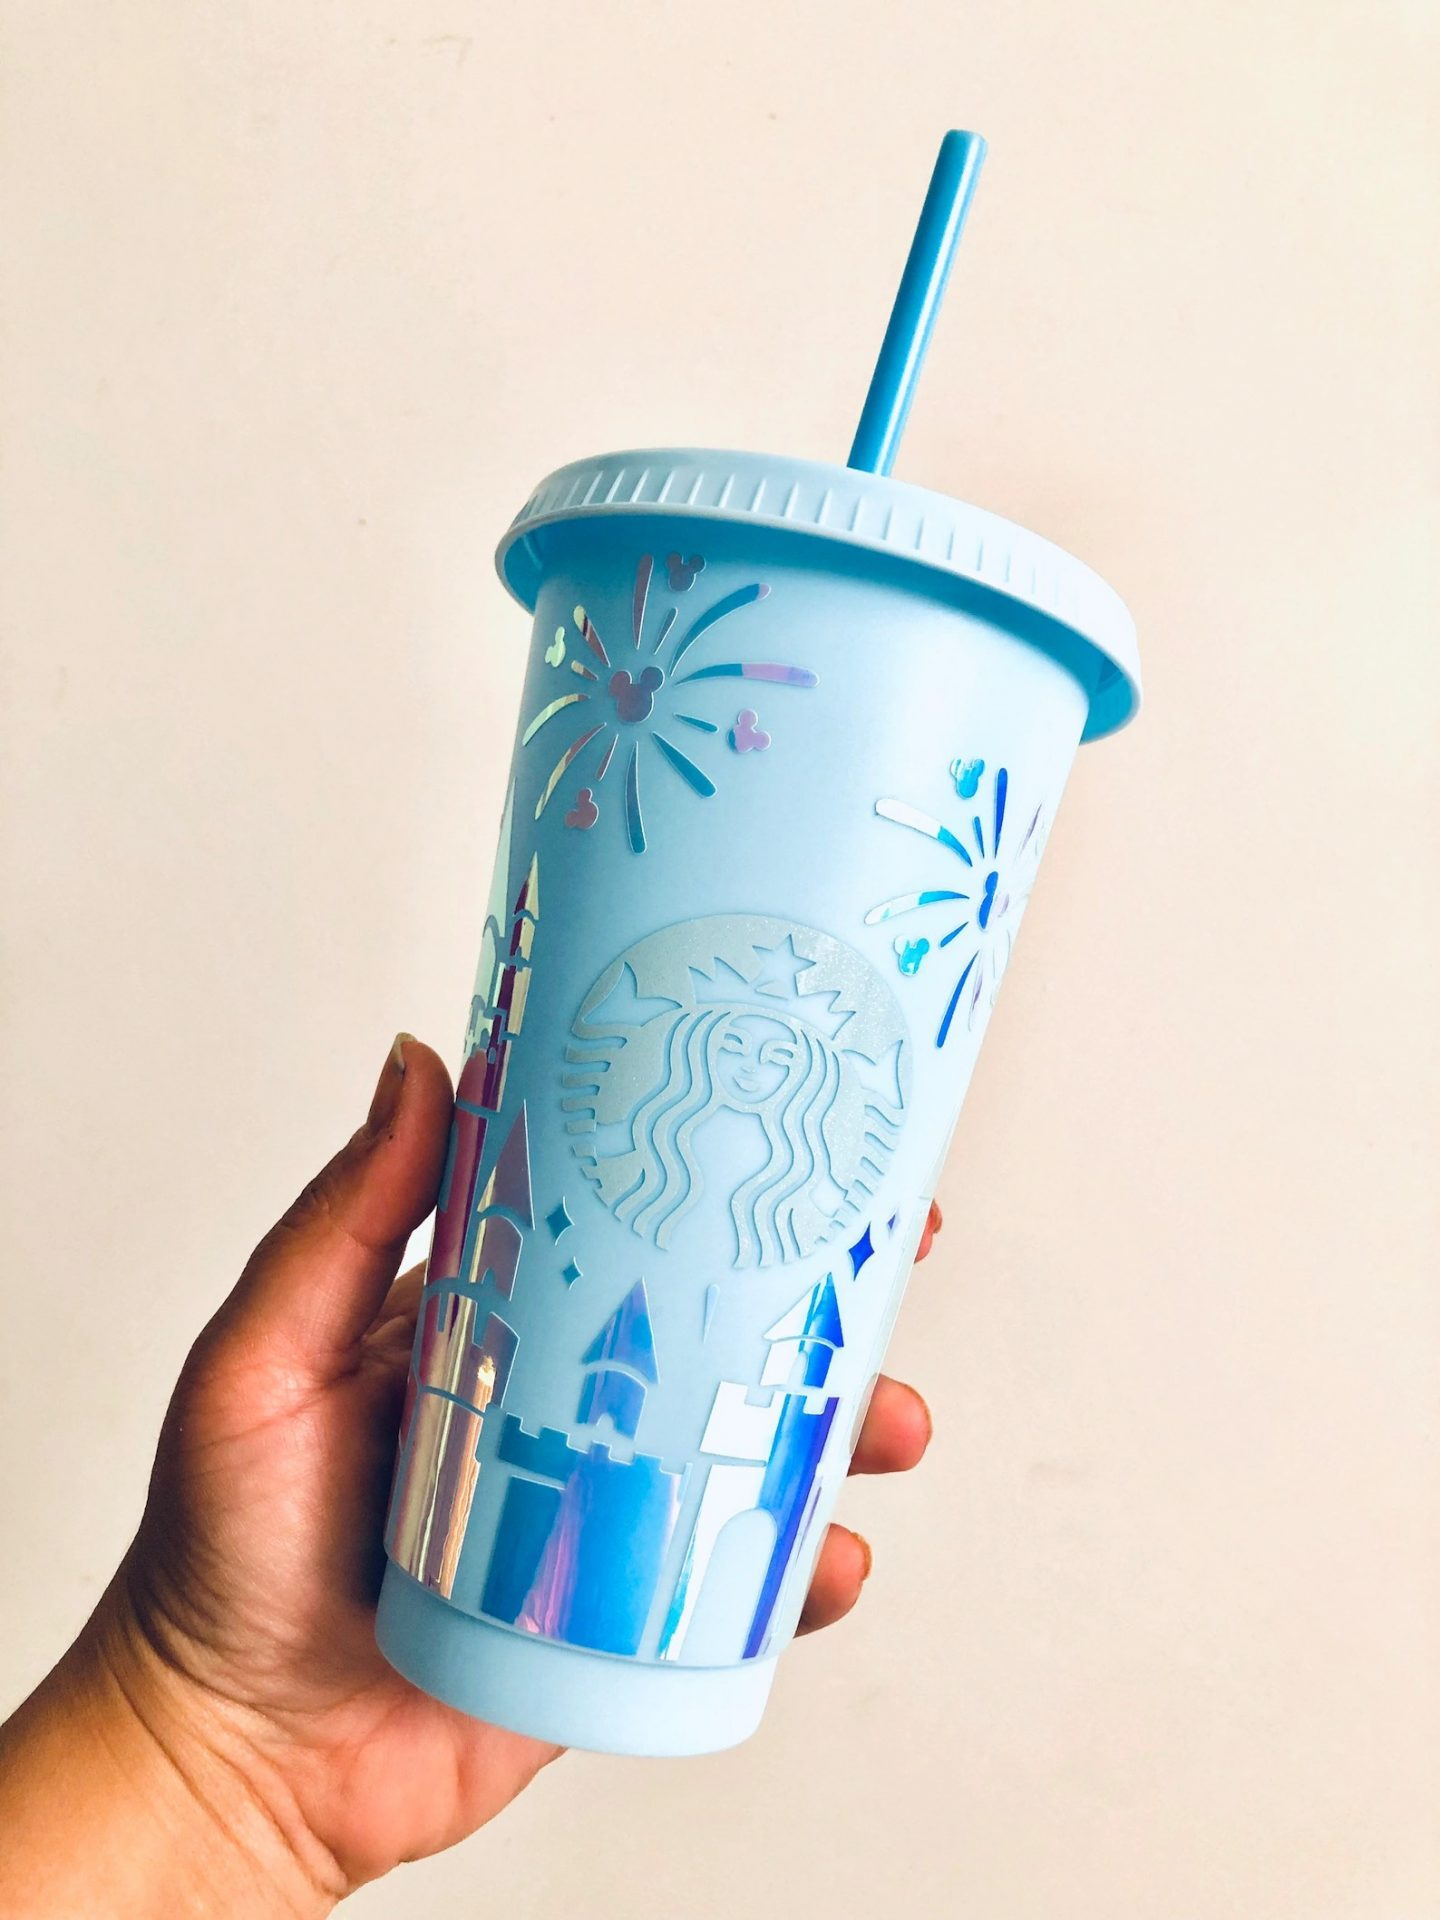 Light blue Disney personalized Starbucks cup